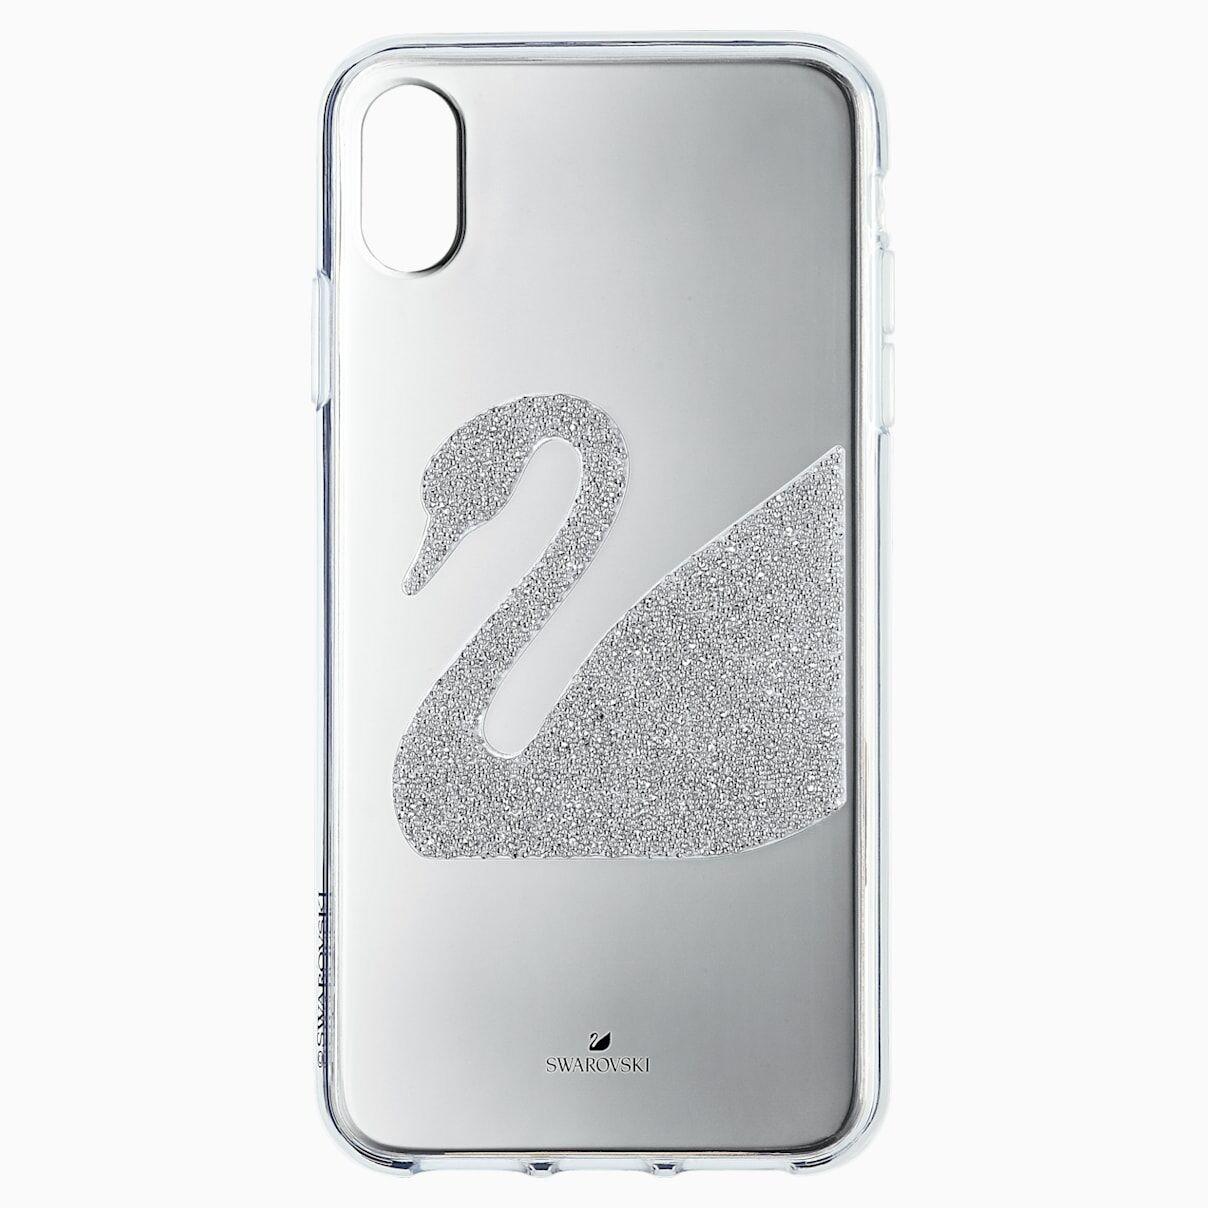 Swarovski Swan Smartphone Case, iPhone® XS Max, Gray